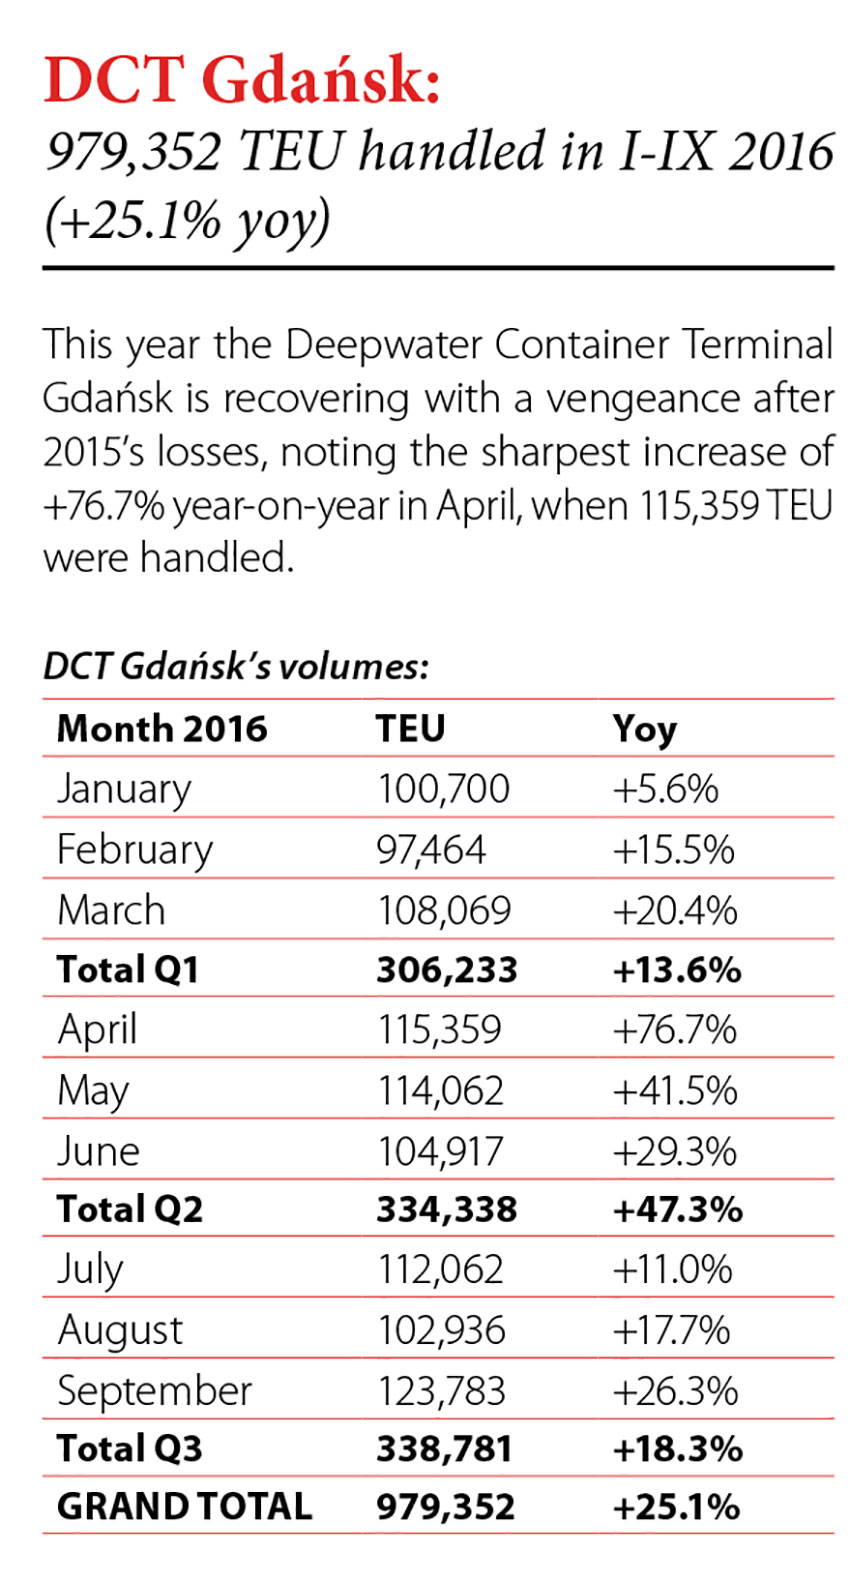 DCT Gdańsk: 979,352 TEU handled in I-IX 2016 (+25.1% yoy) // Baltic Transport Journal. - 2016, nr 5, s. 8